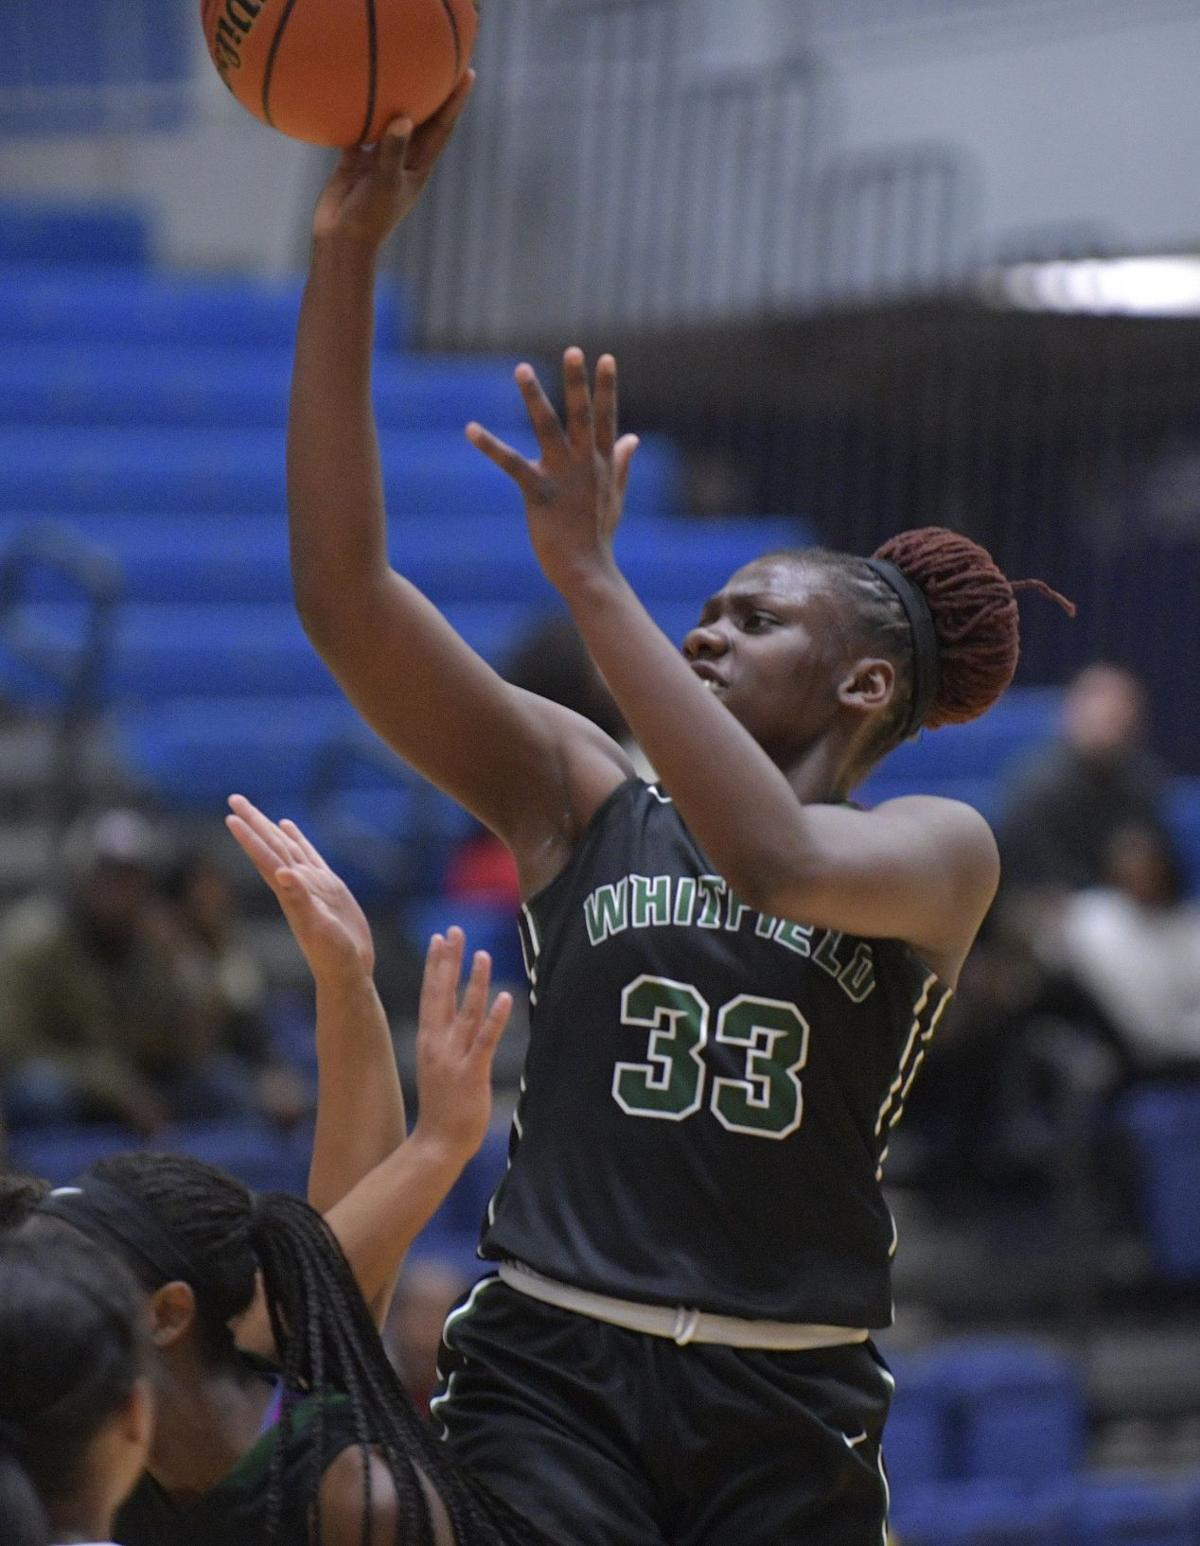 Whitfield vs O'Fallon girls basketball